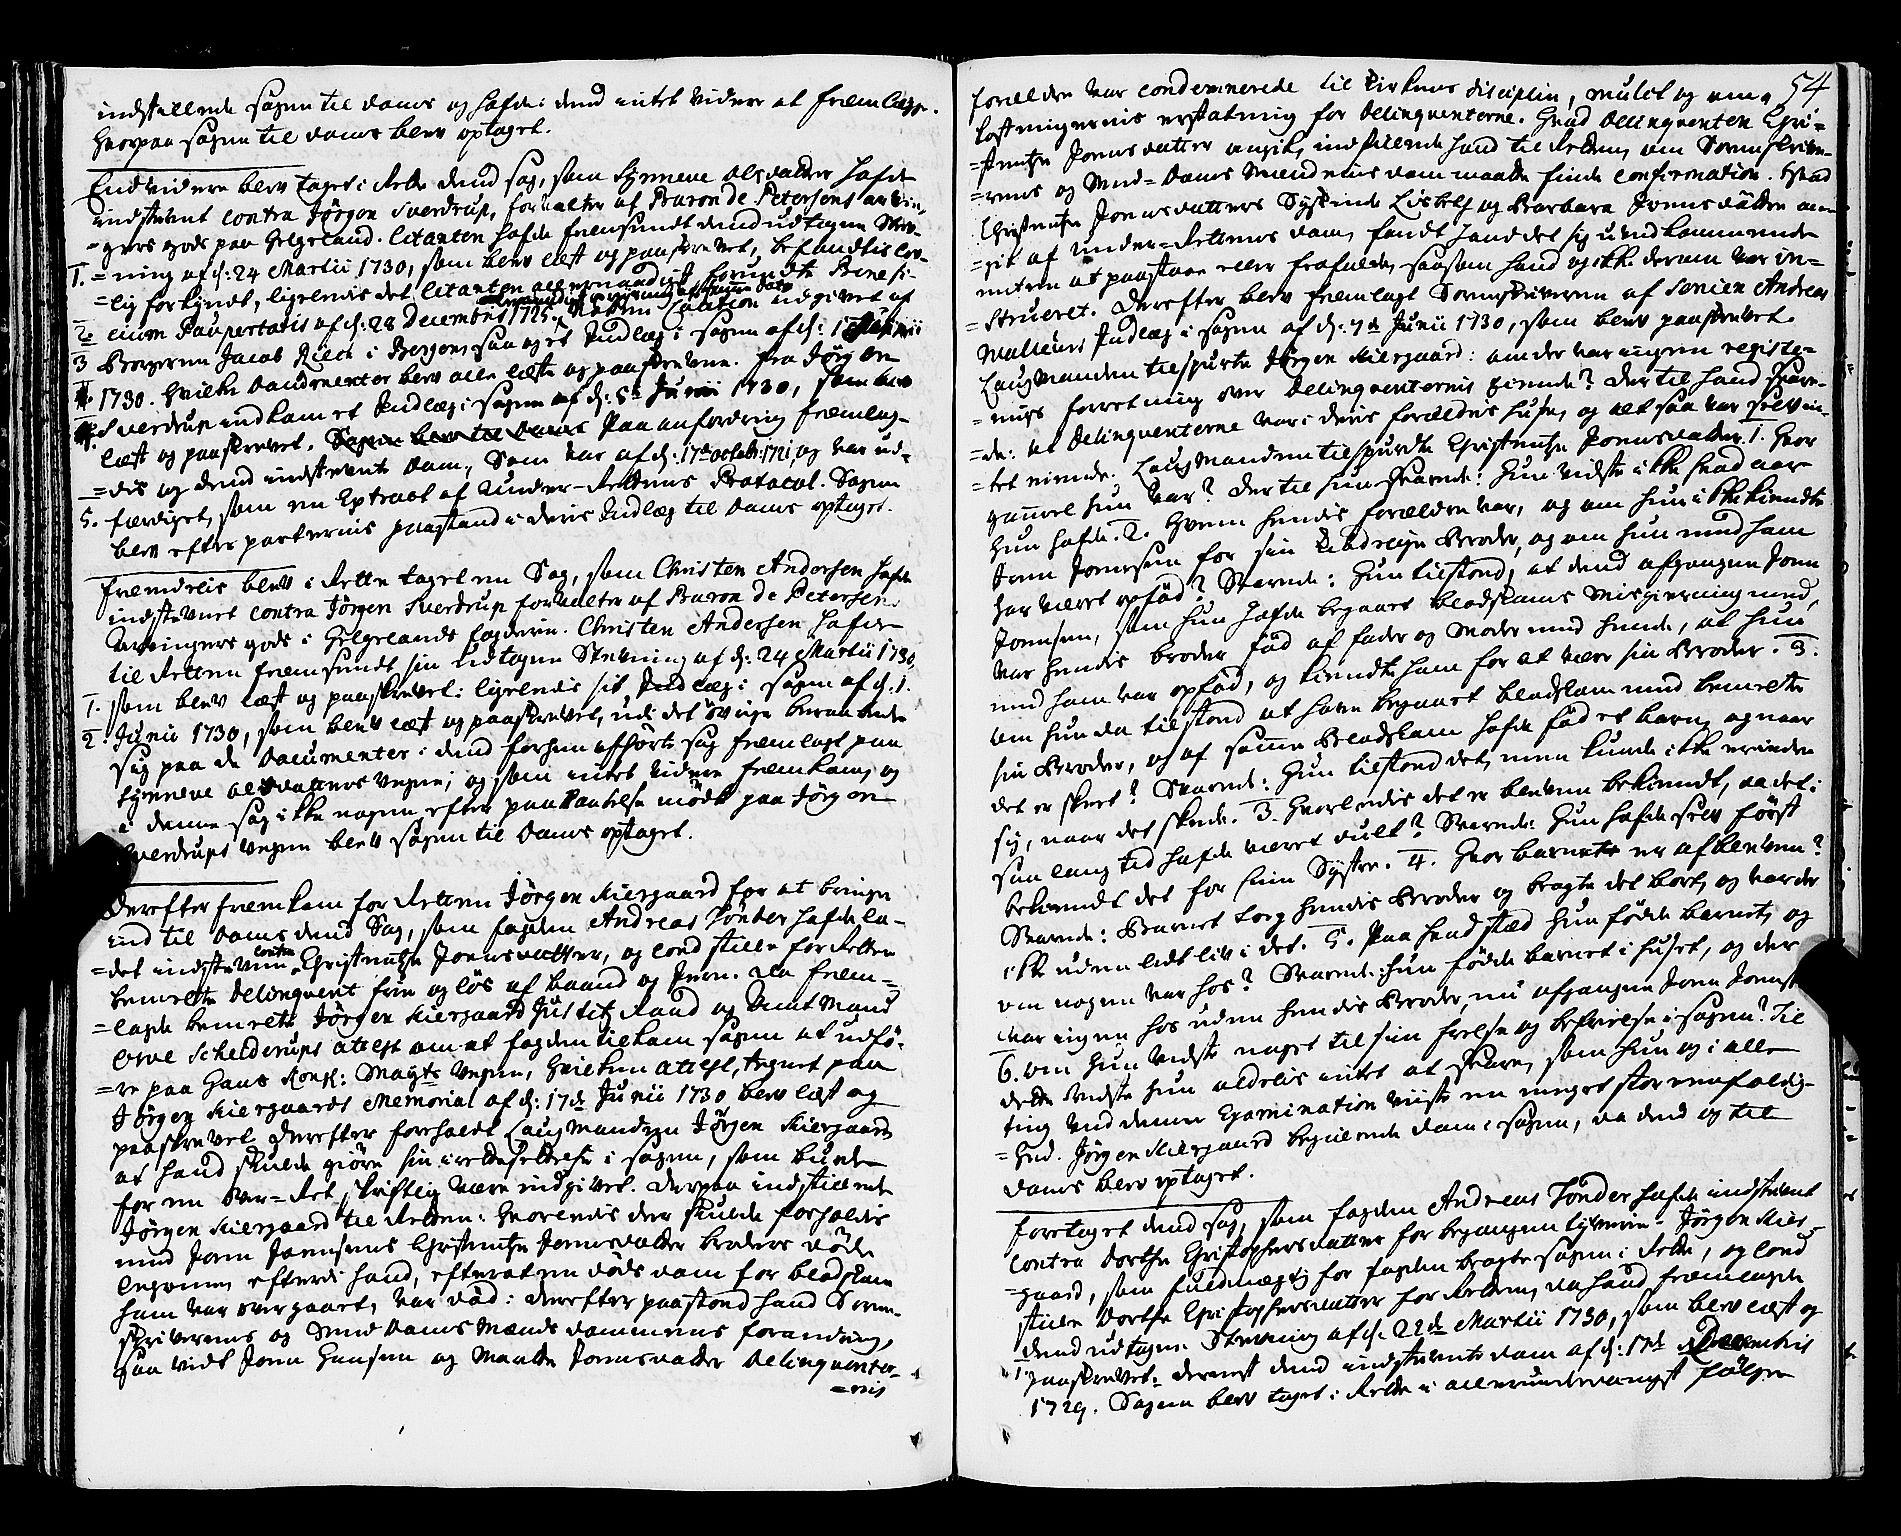 SAT, Nordland og Finmarks lagstol*, 1730-1740, s. 53b-54a